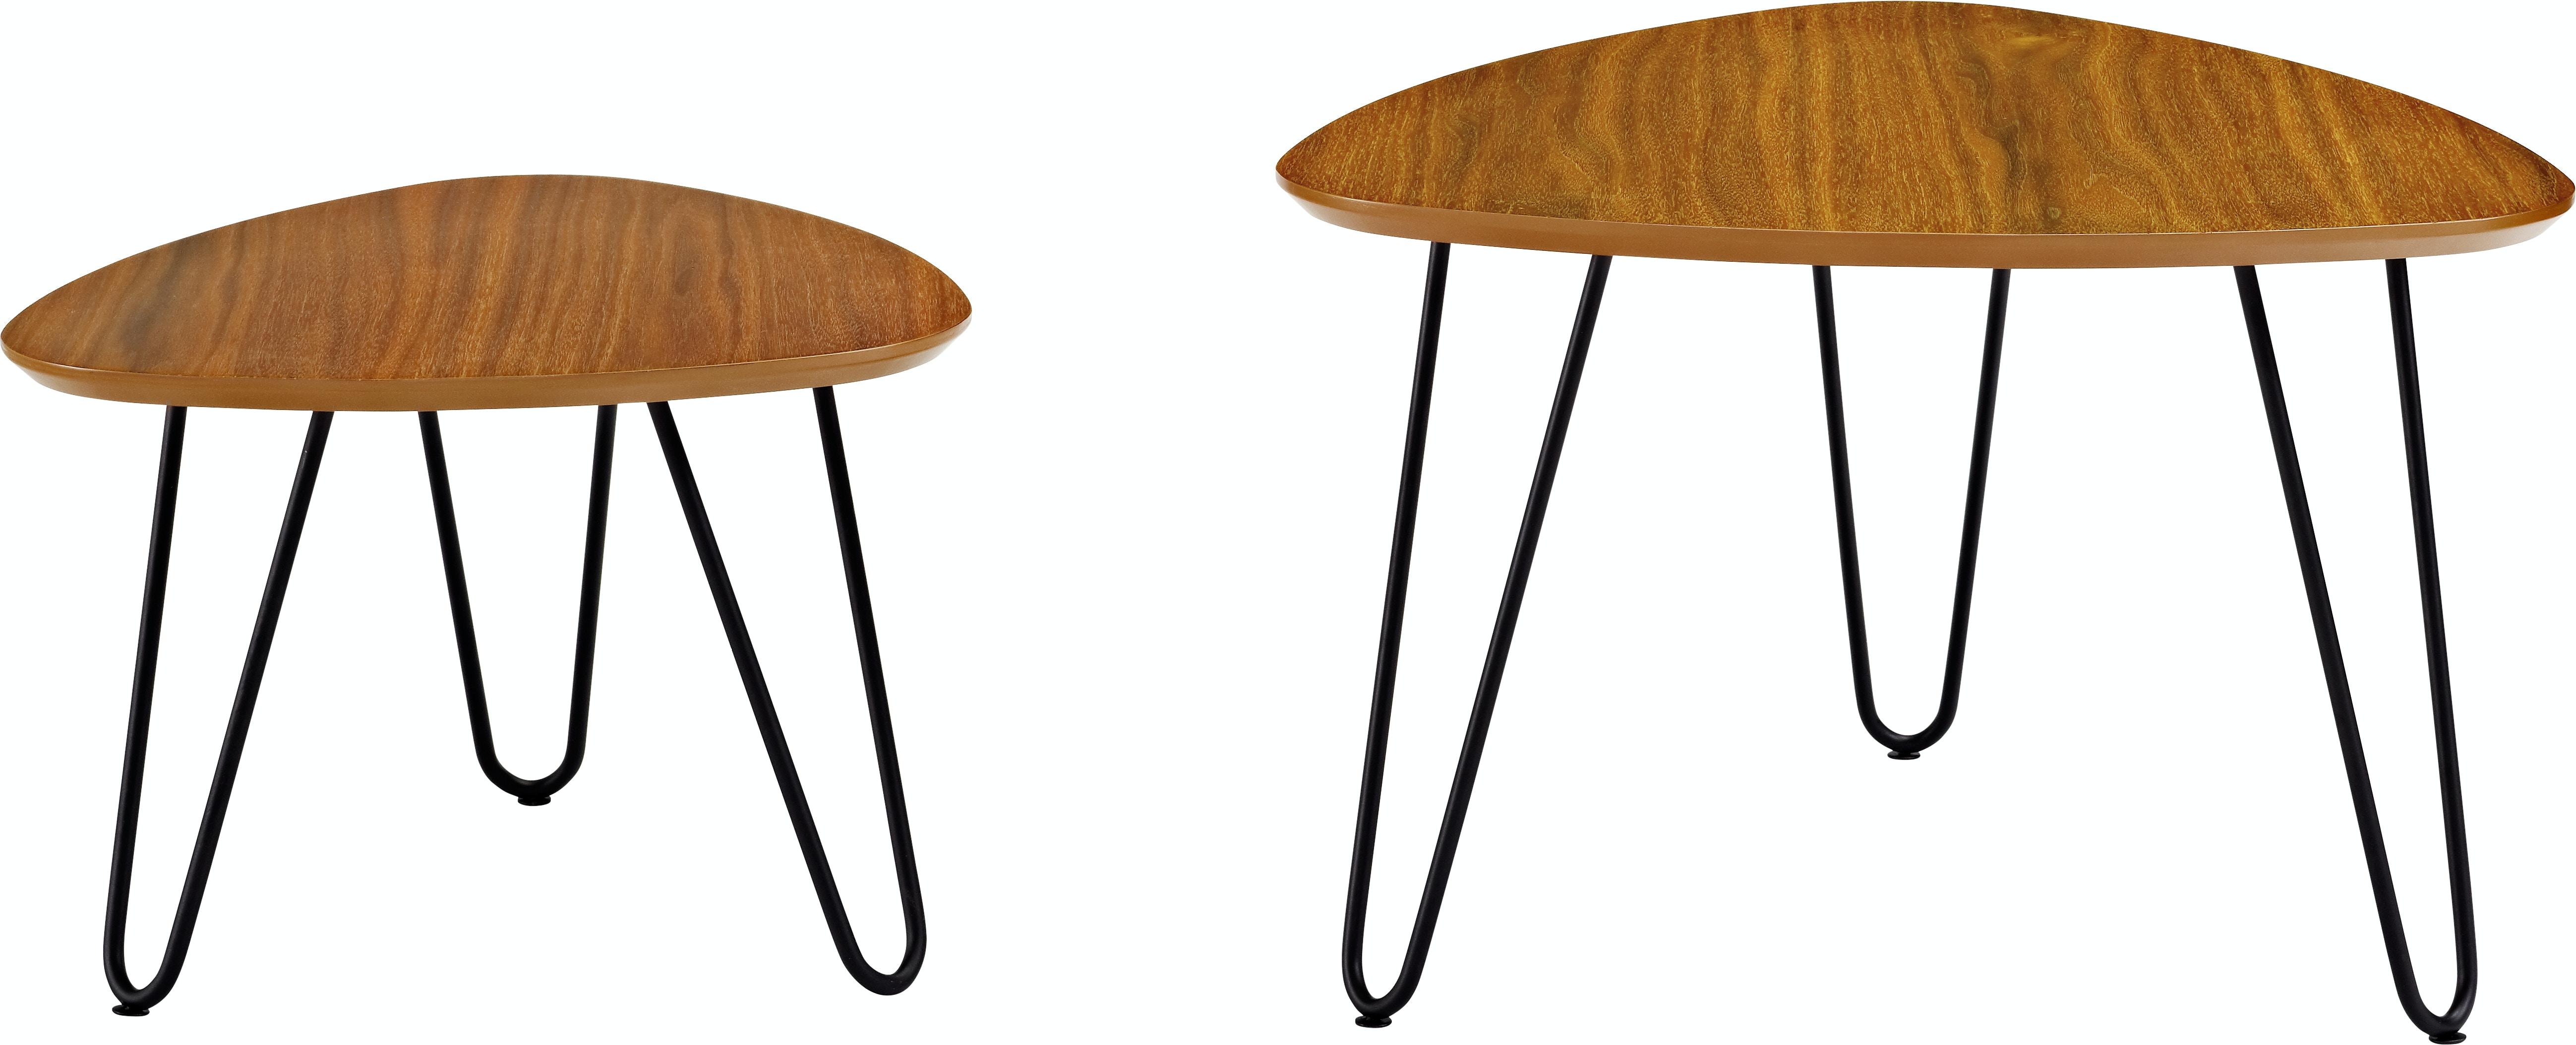 Hairpin Leg Wood Nesting Coffee Table Set Wedaf24hpncwt